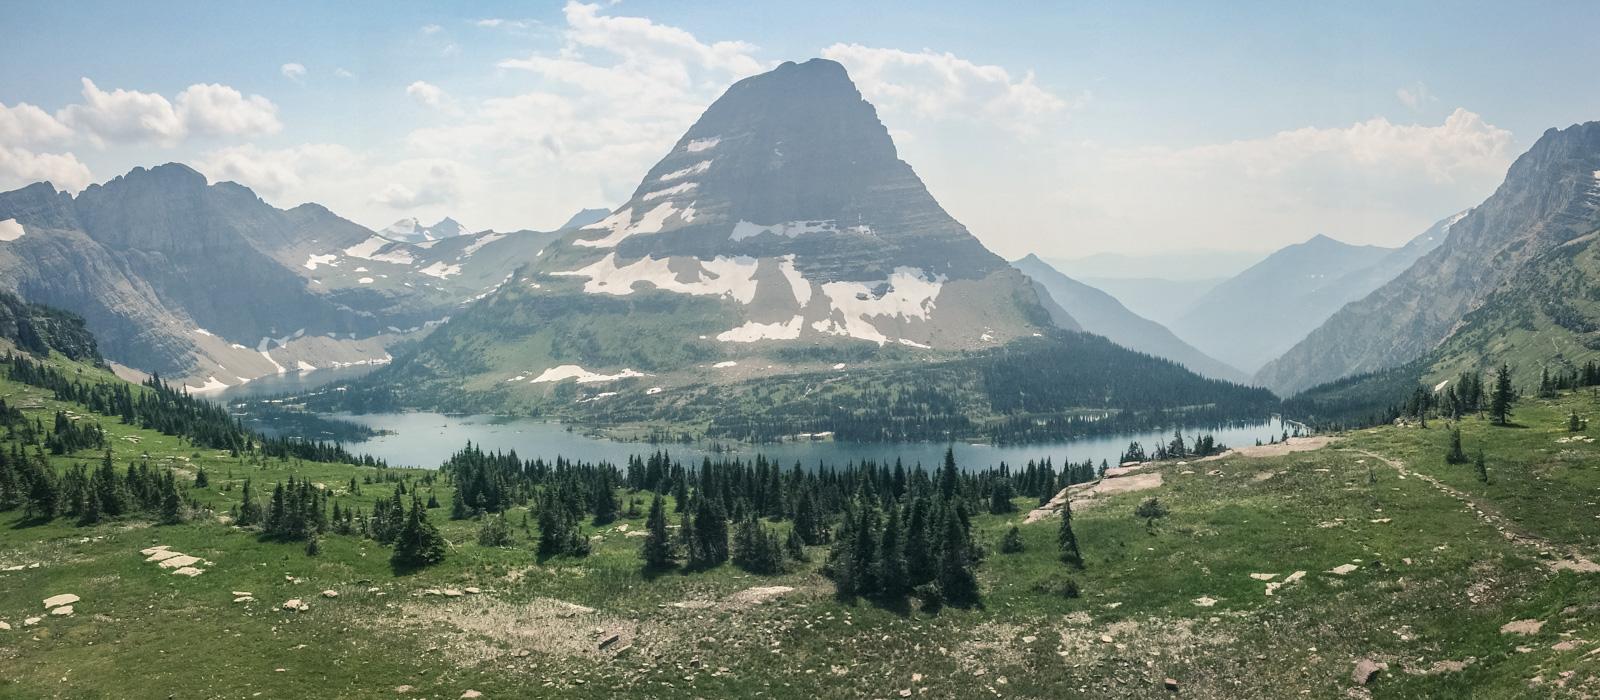 GlacierNationalPark-Montana-AmyRolloPhoto-36.jpg